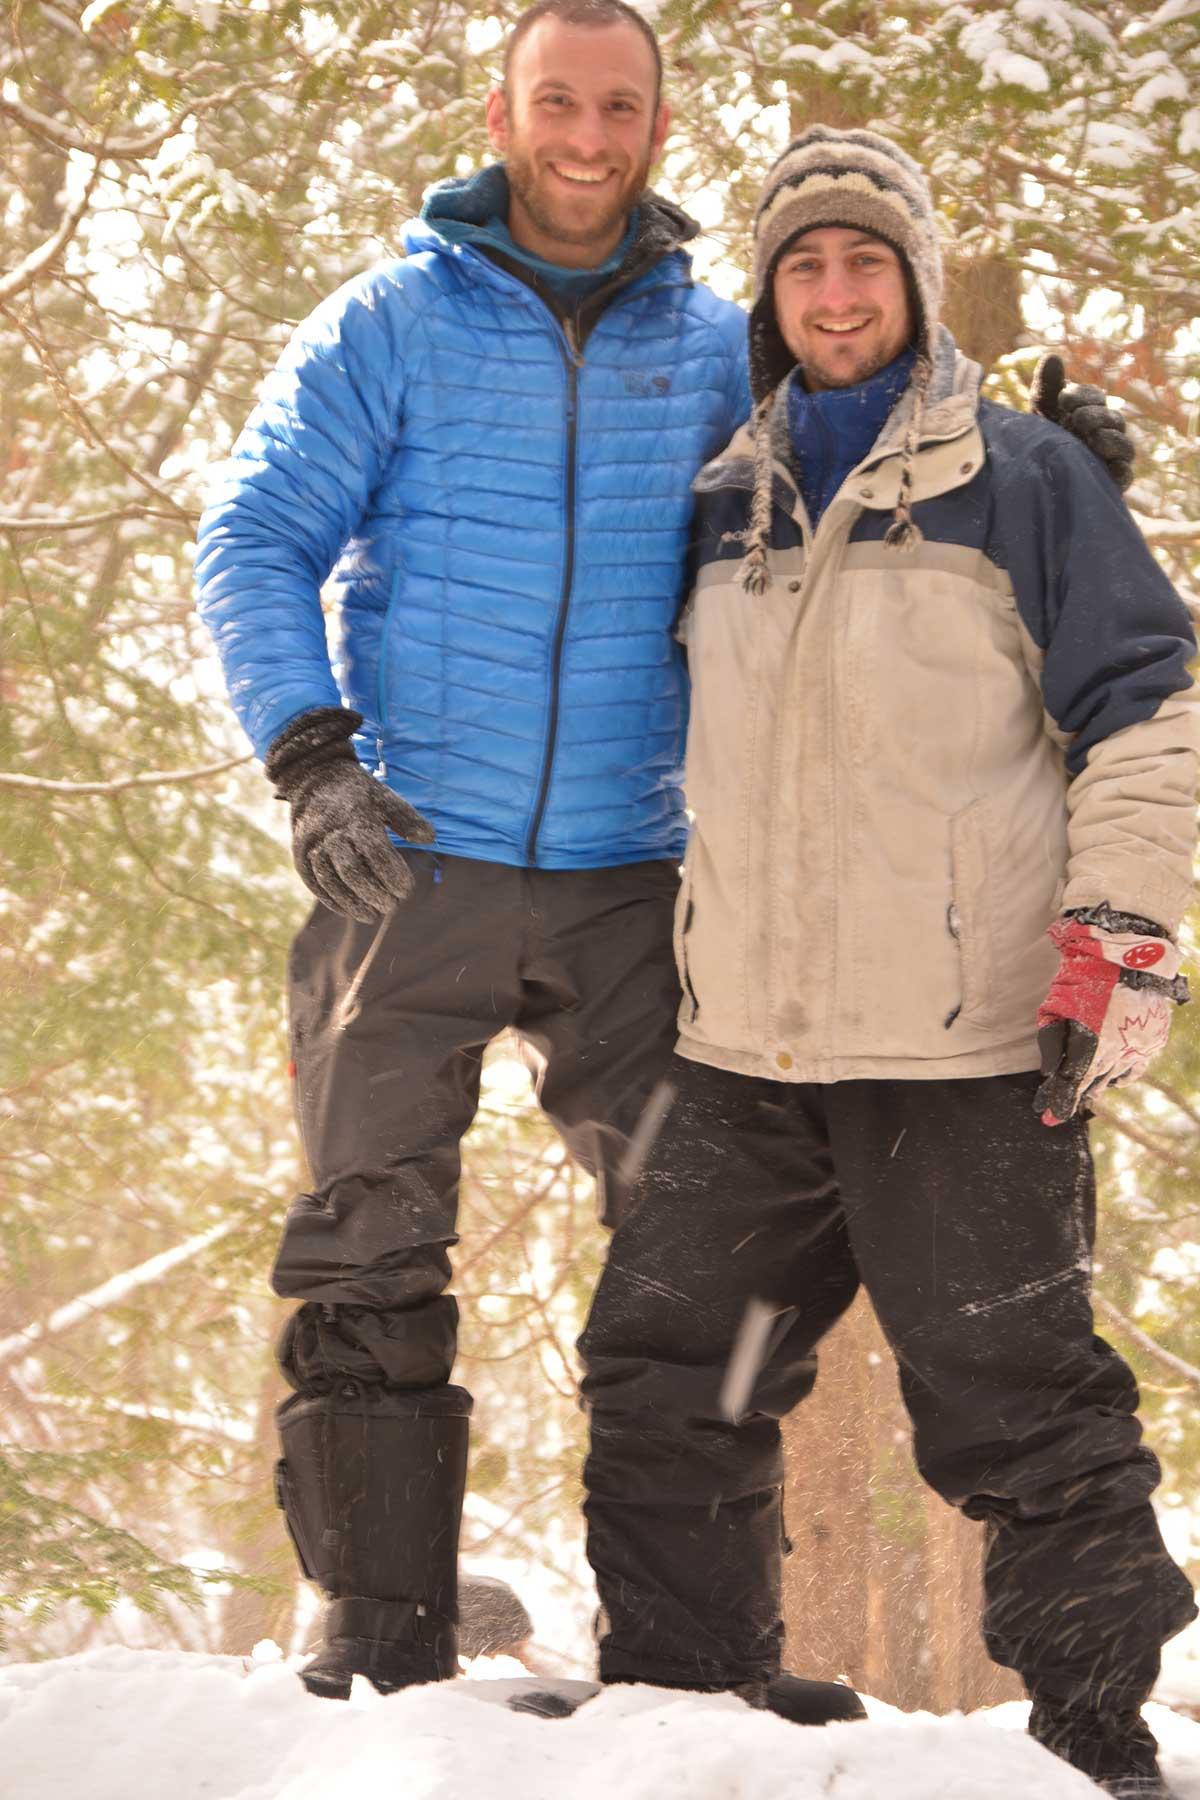 Winter-Camping-Feb-17-19,-2015-184.jpg